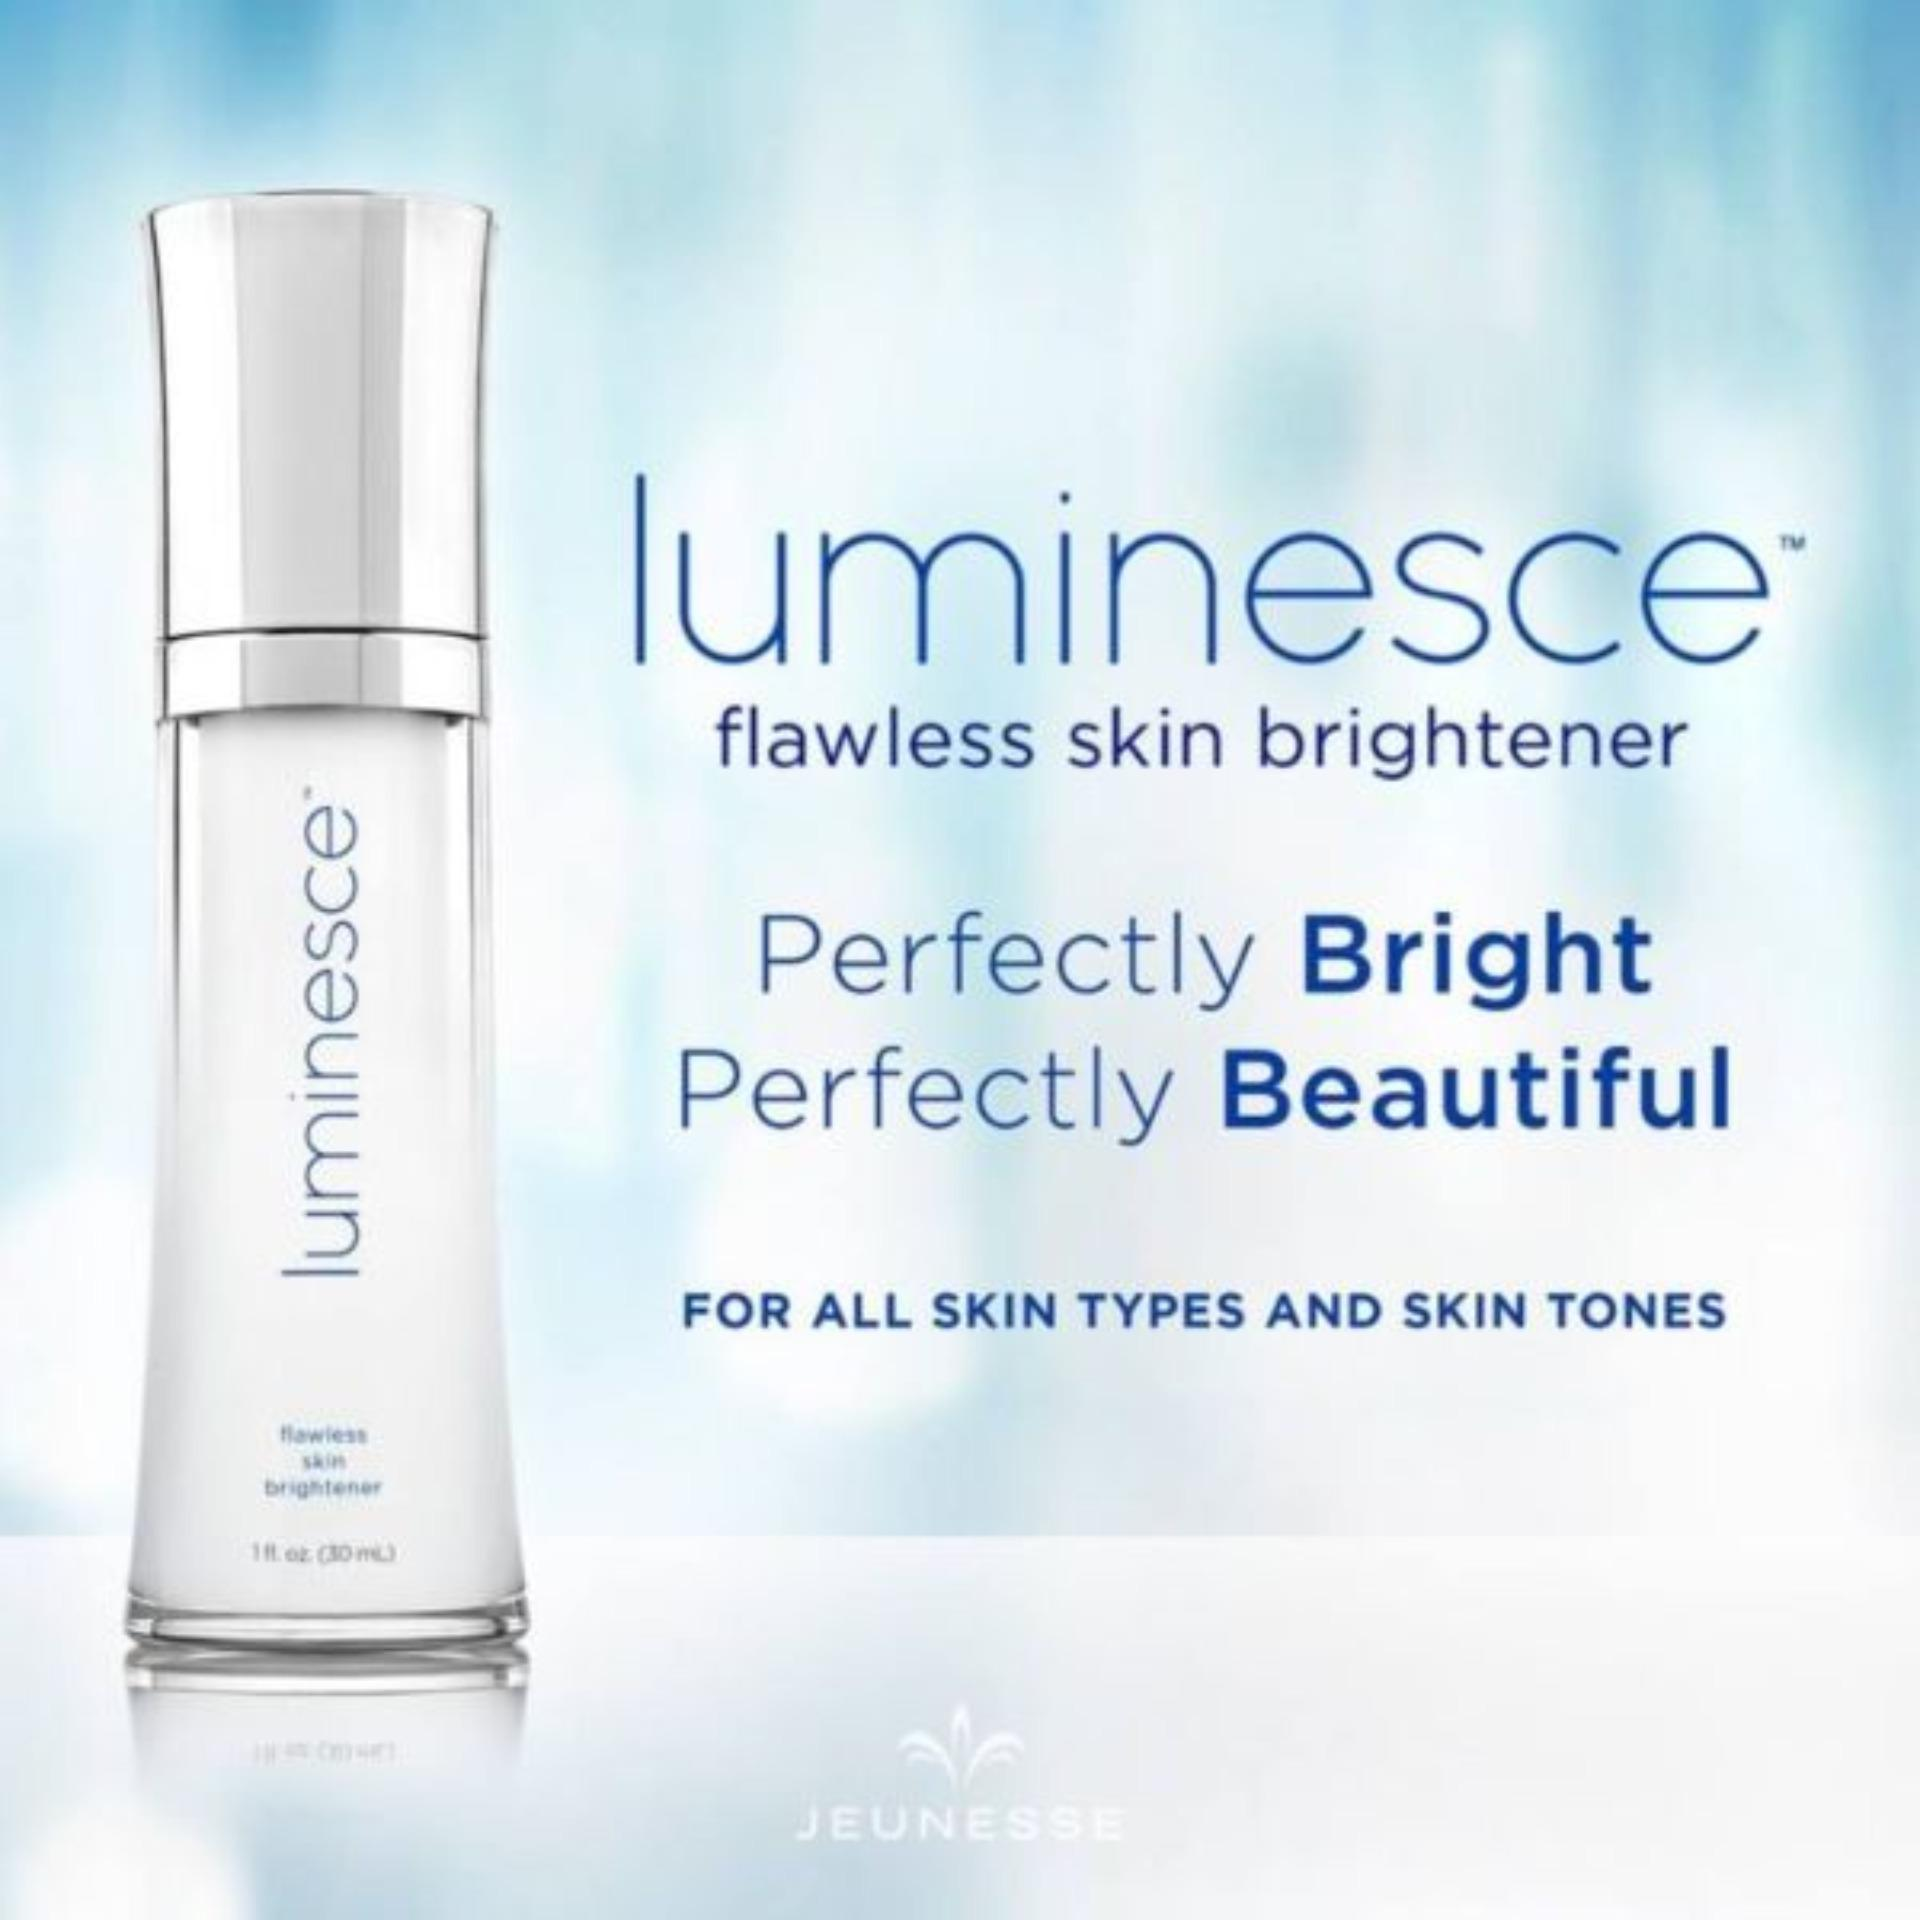 Lowest Price Jeunesse Flawless Brightener Reduce Sun Spot Age Spot Pregany Spot Freckles Pore Size